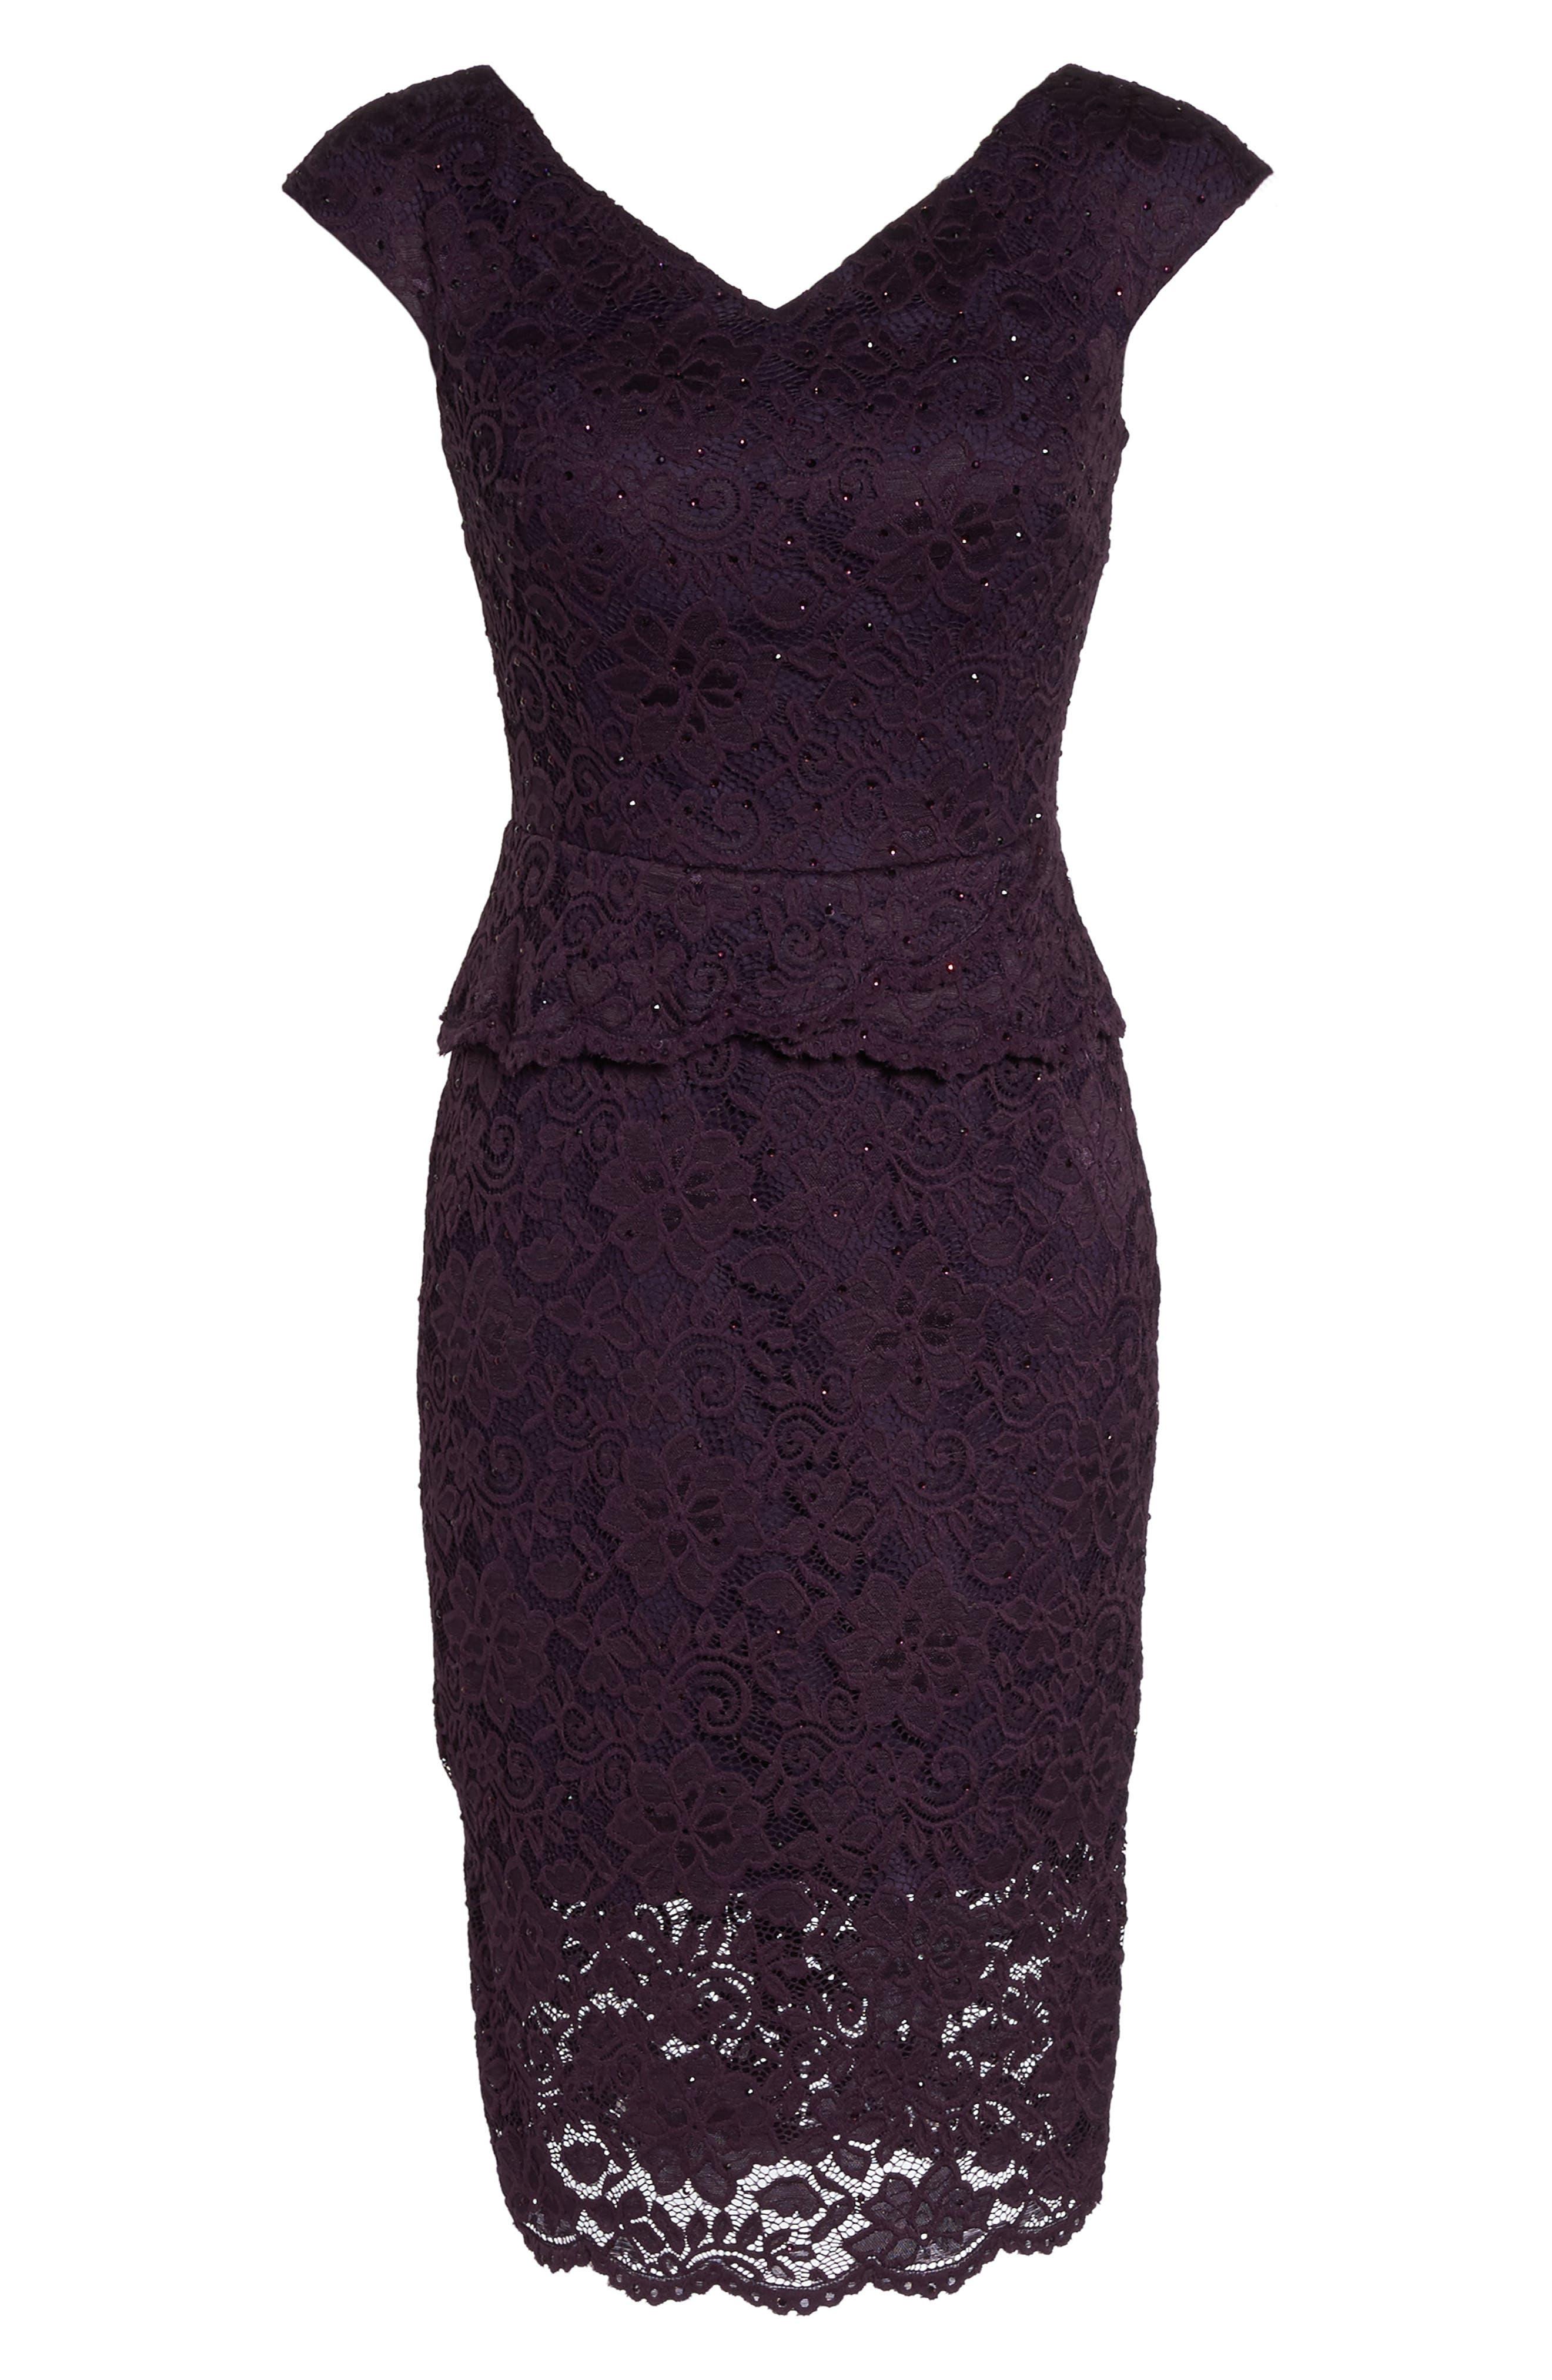 Embellished Lace Sheath Dress,                             Alternate thumbnail 6, color,                             Plum